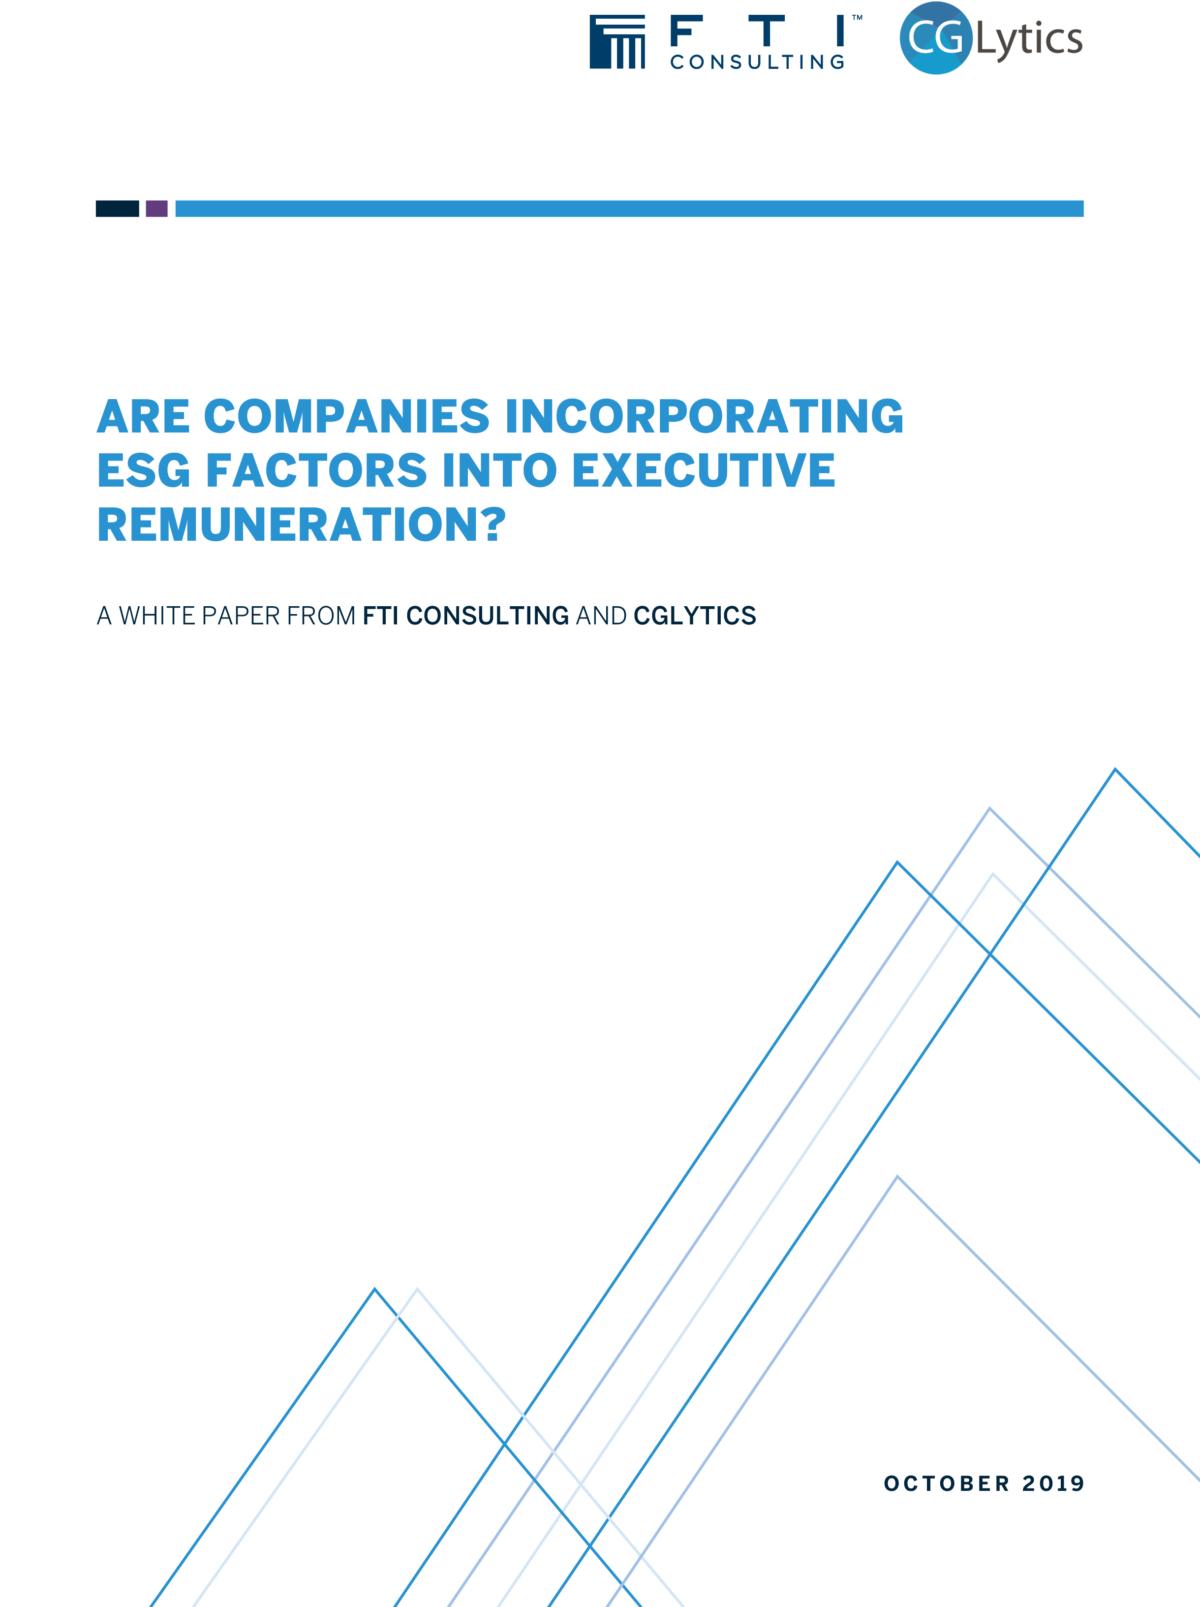 Are companies incorporating ESG factors into executive remuneration?